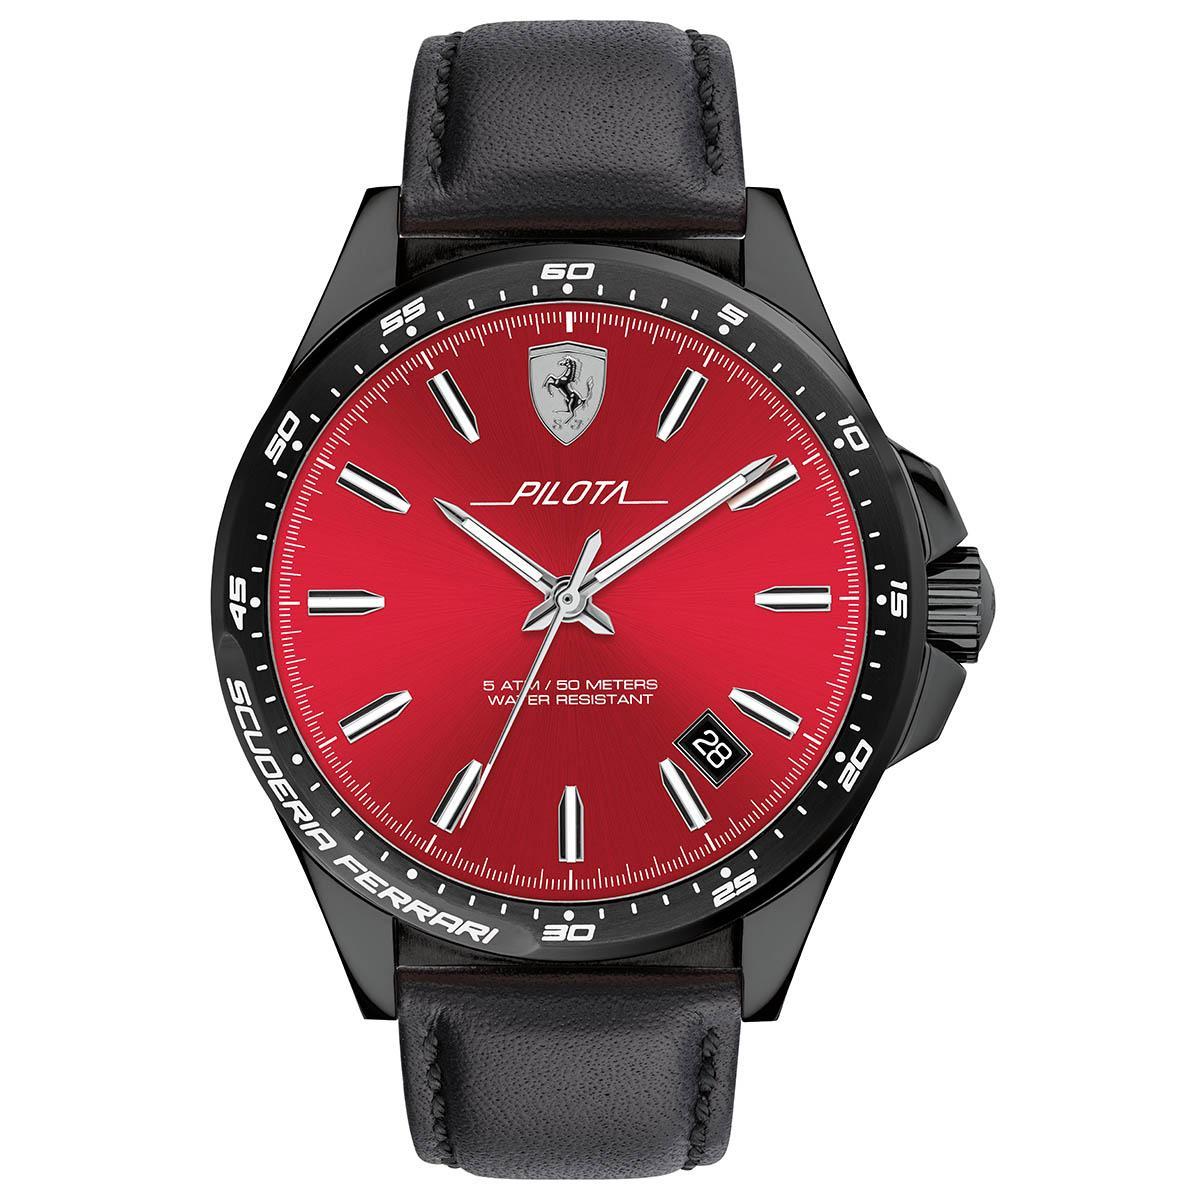 Ferrari Ferrari Pilota Black Stainless-Steel Case Leather Strap Mens NWT + Warranty 0830525